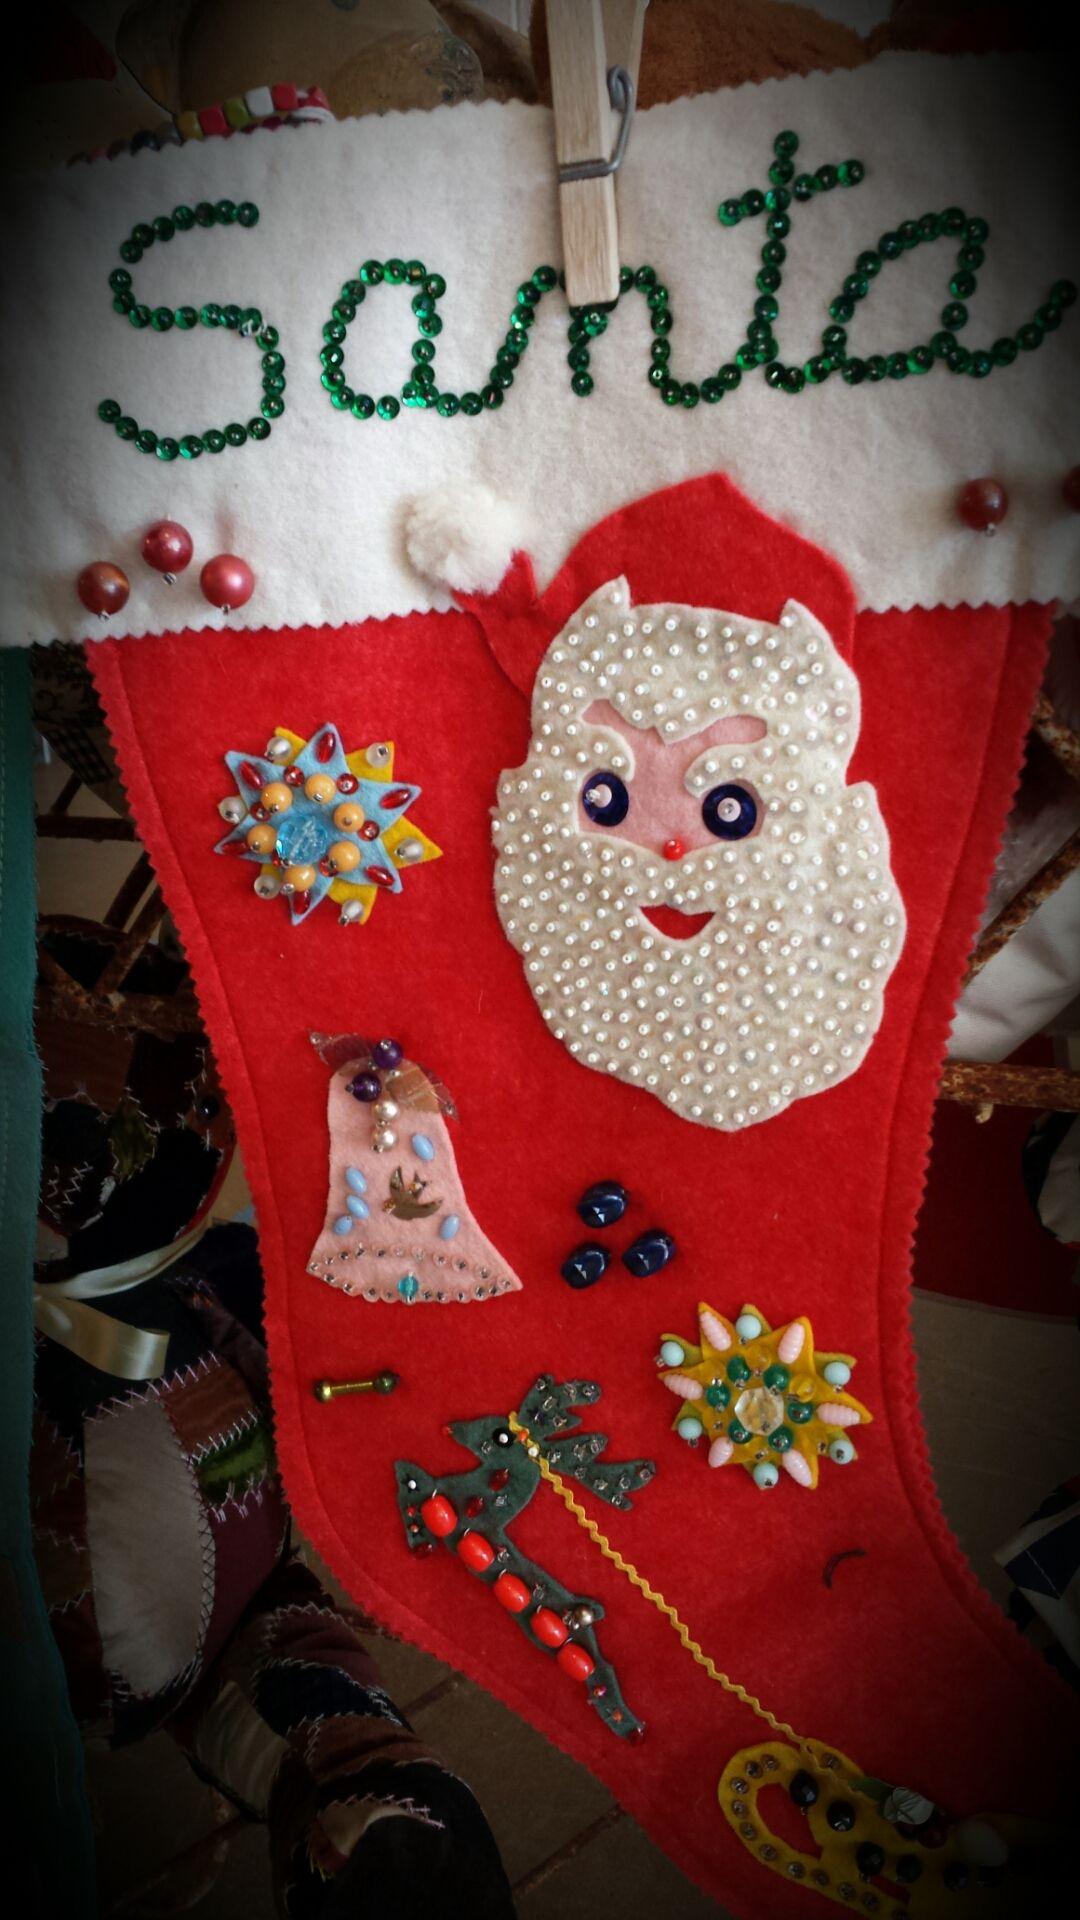 50s Handmade Christmas Stocking Santa Felt Sequins Applique Embellished